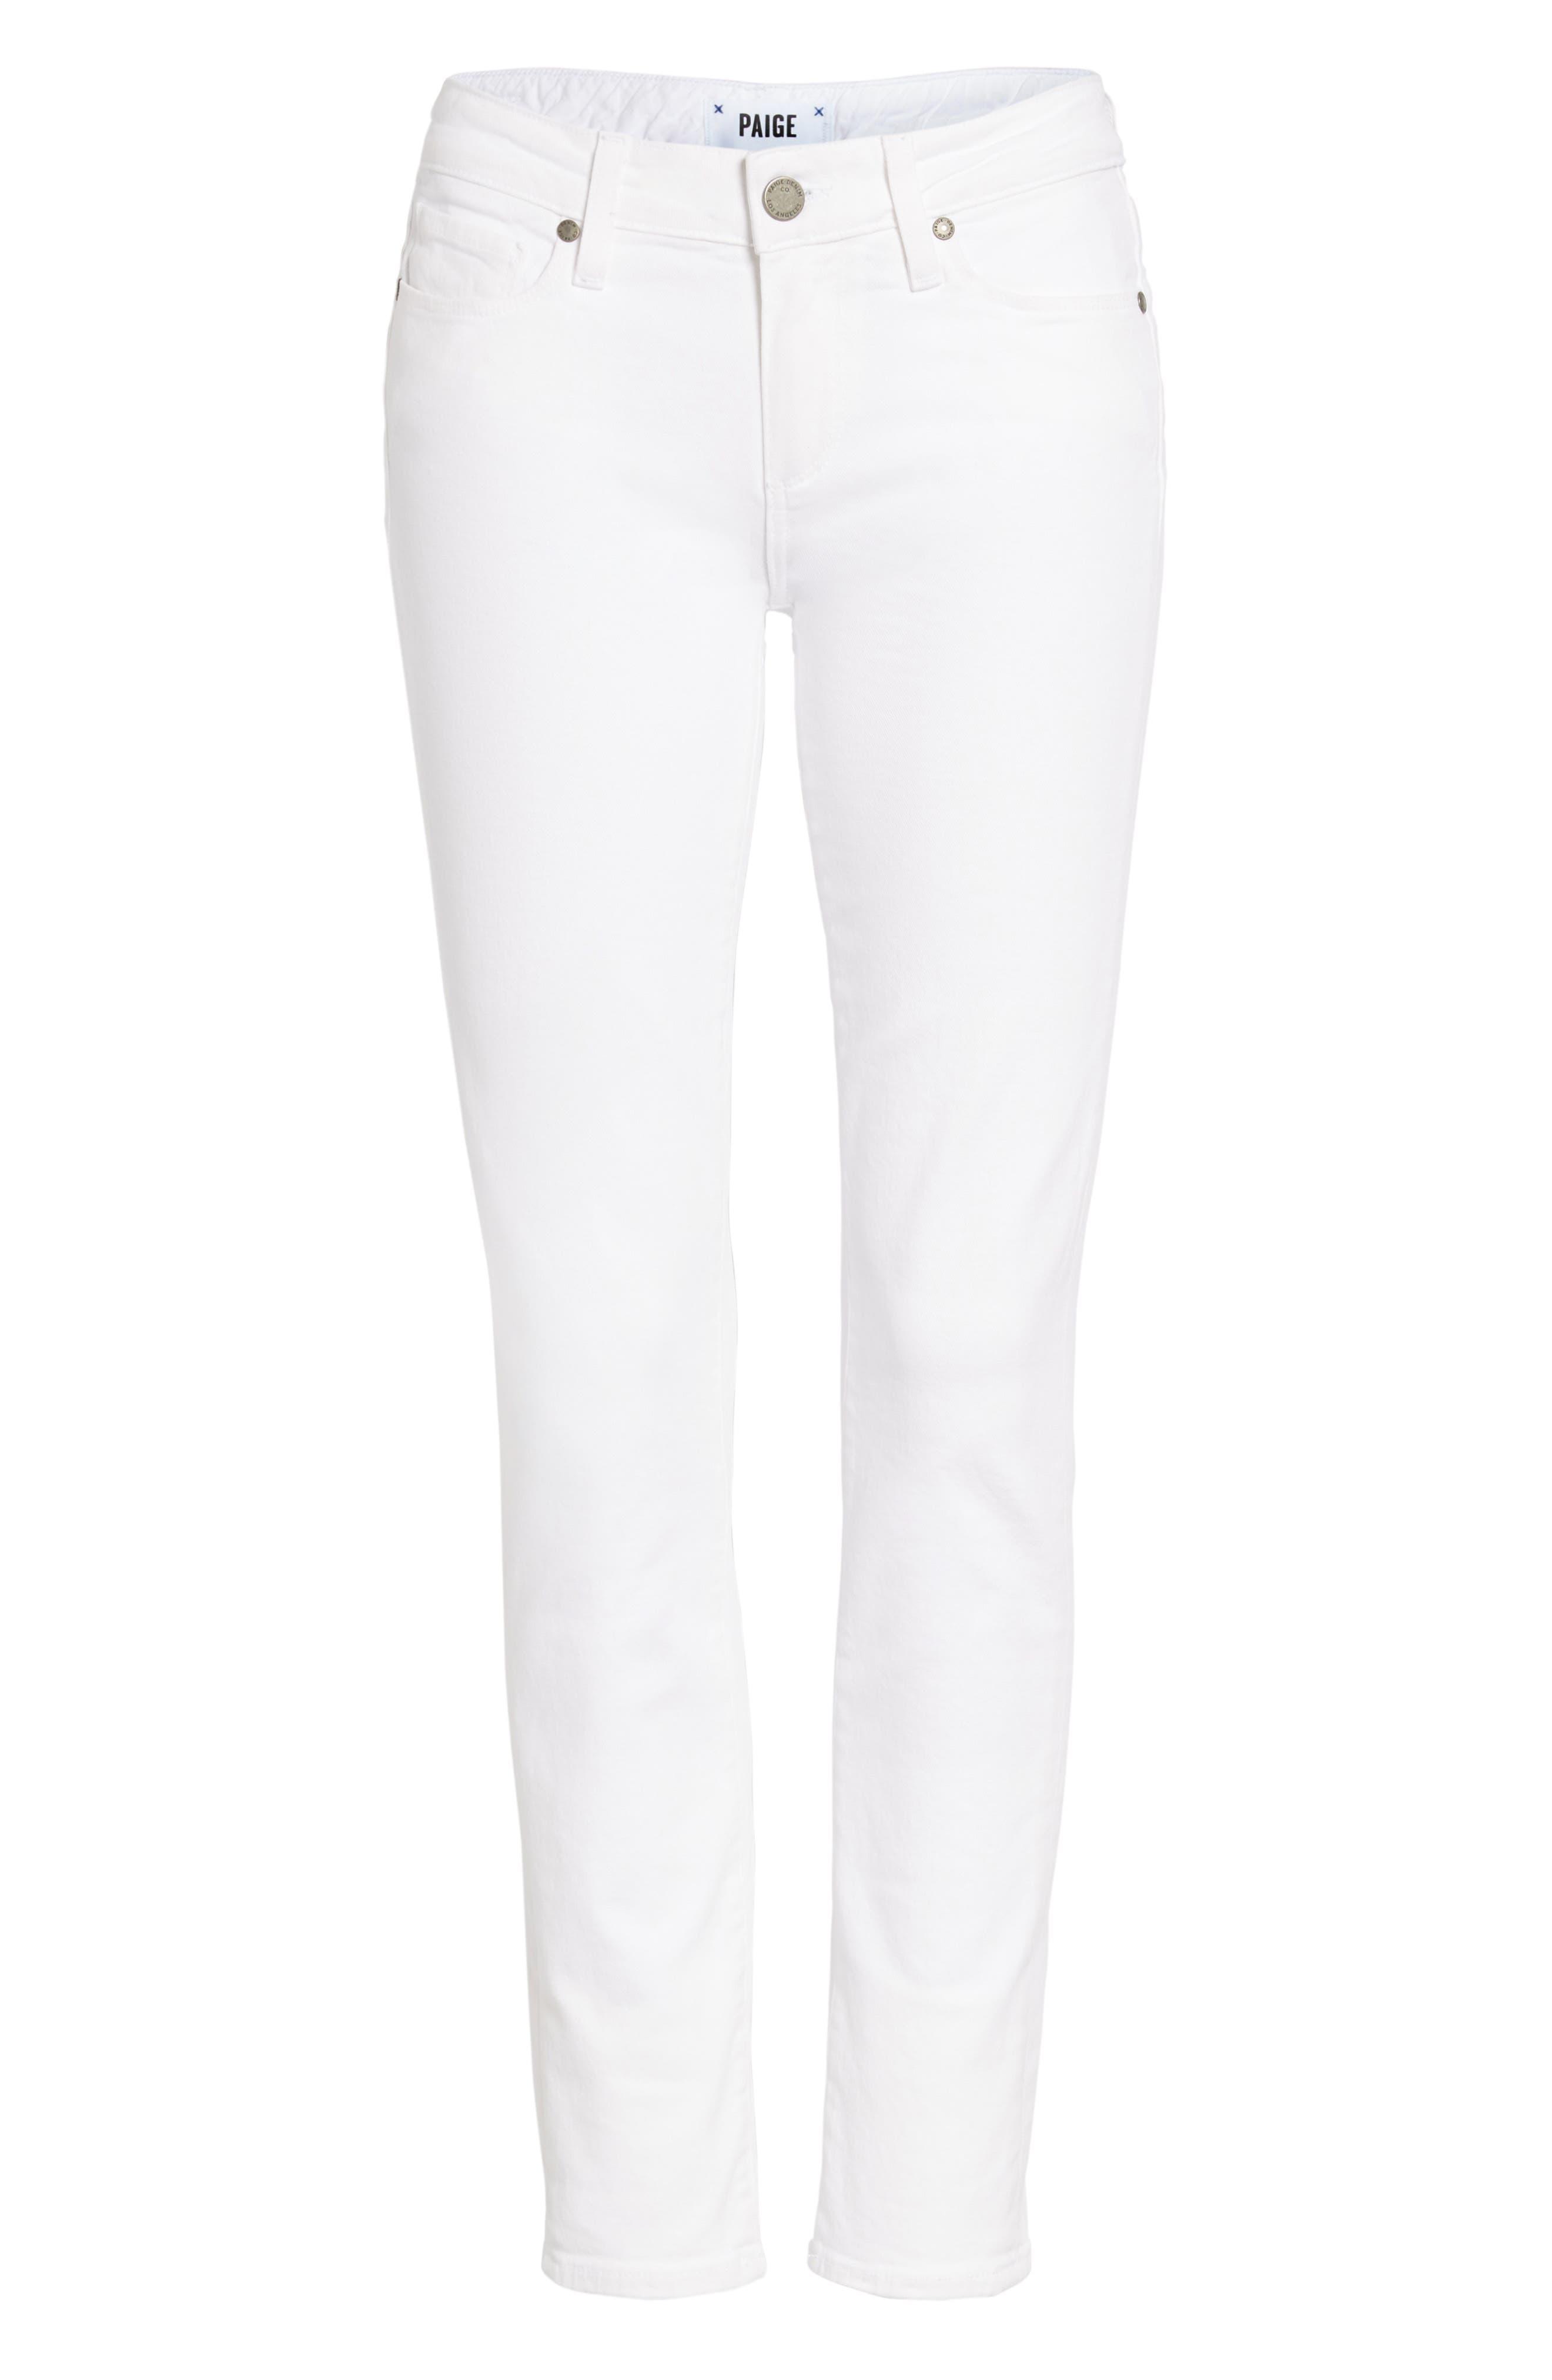 PAIGE, 'Skyline' Ankle Peg Skinny Jeans, Alternate thumbnail 7, color, 100